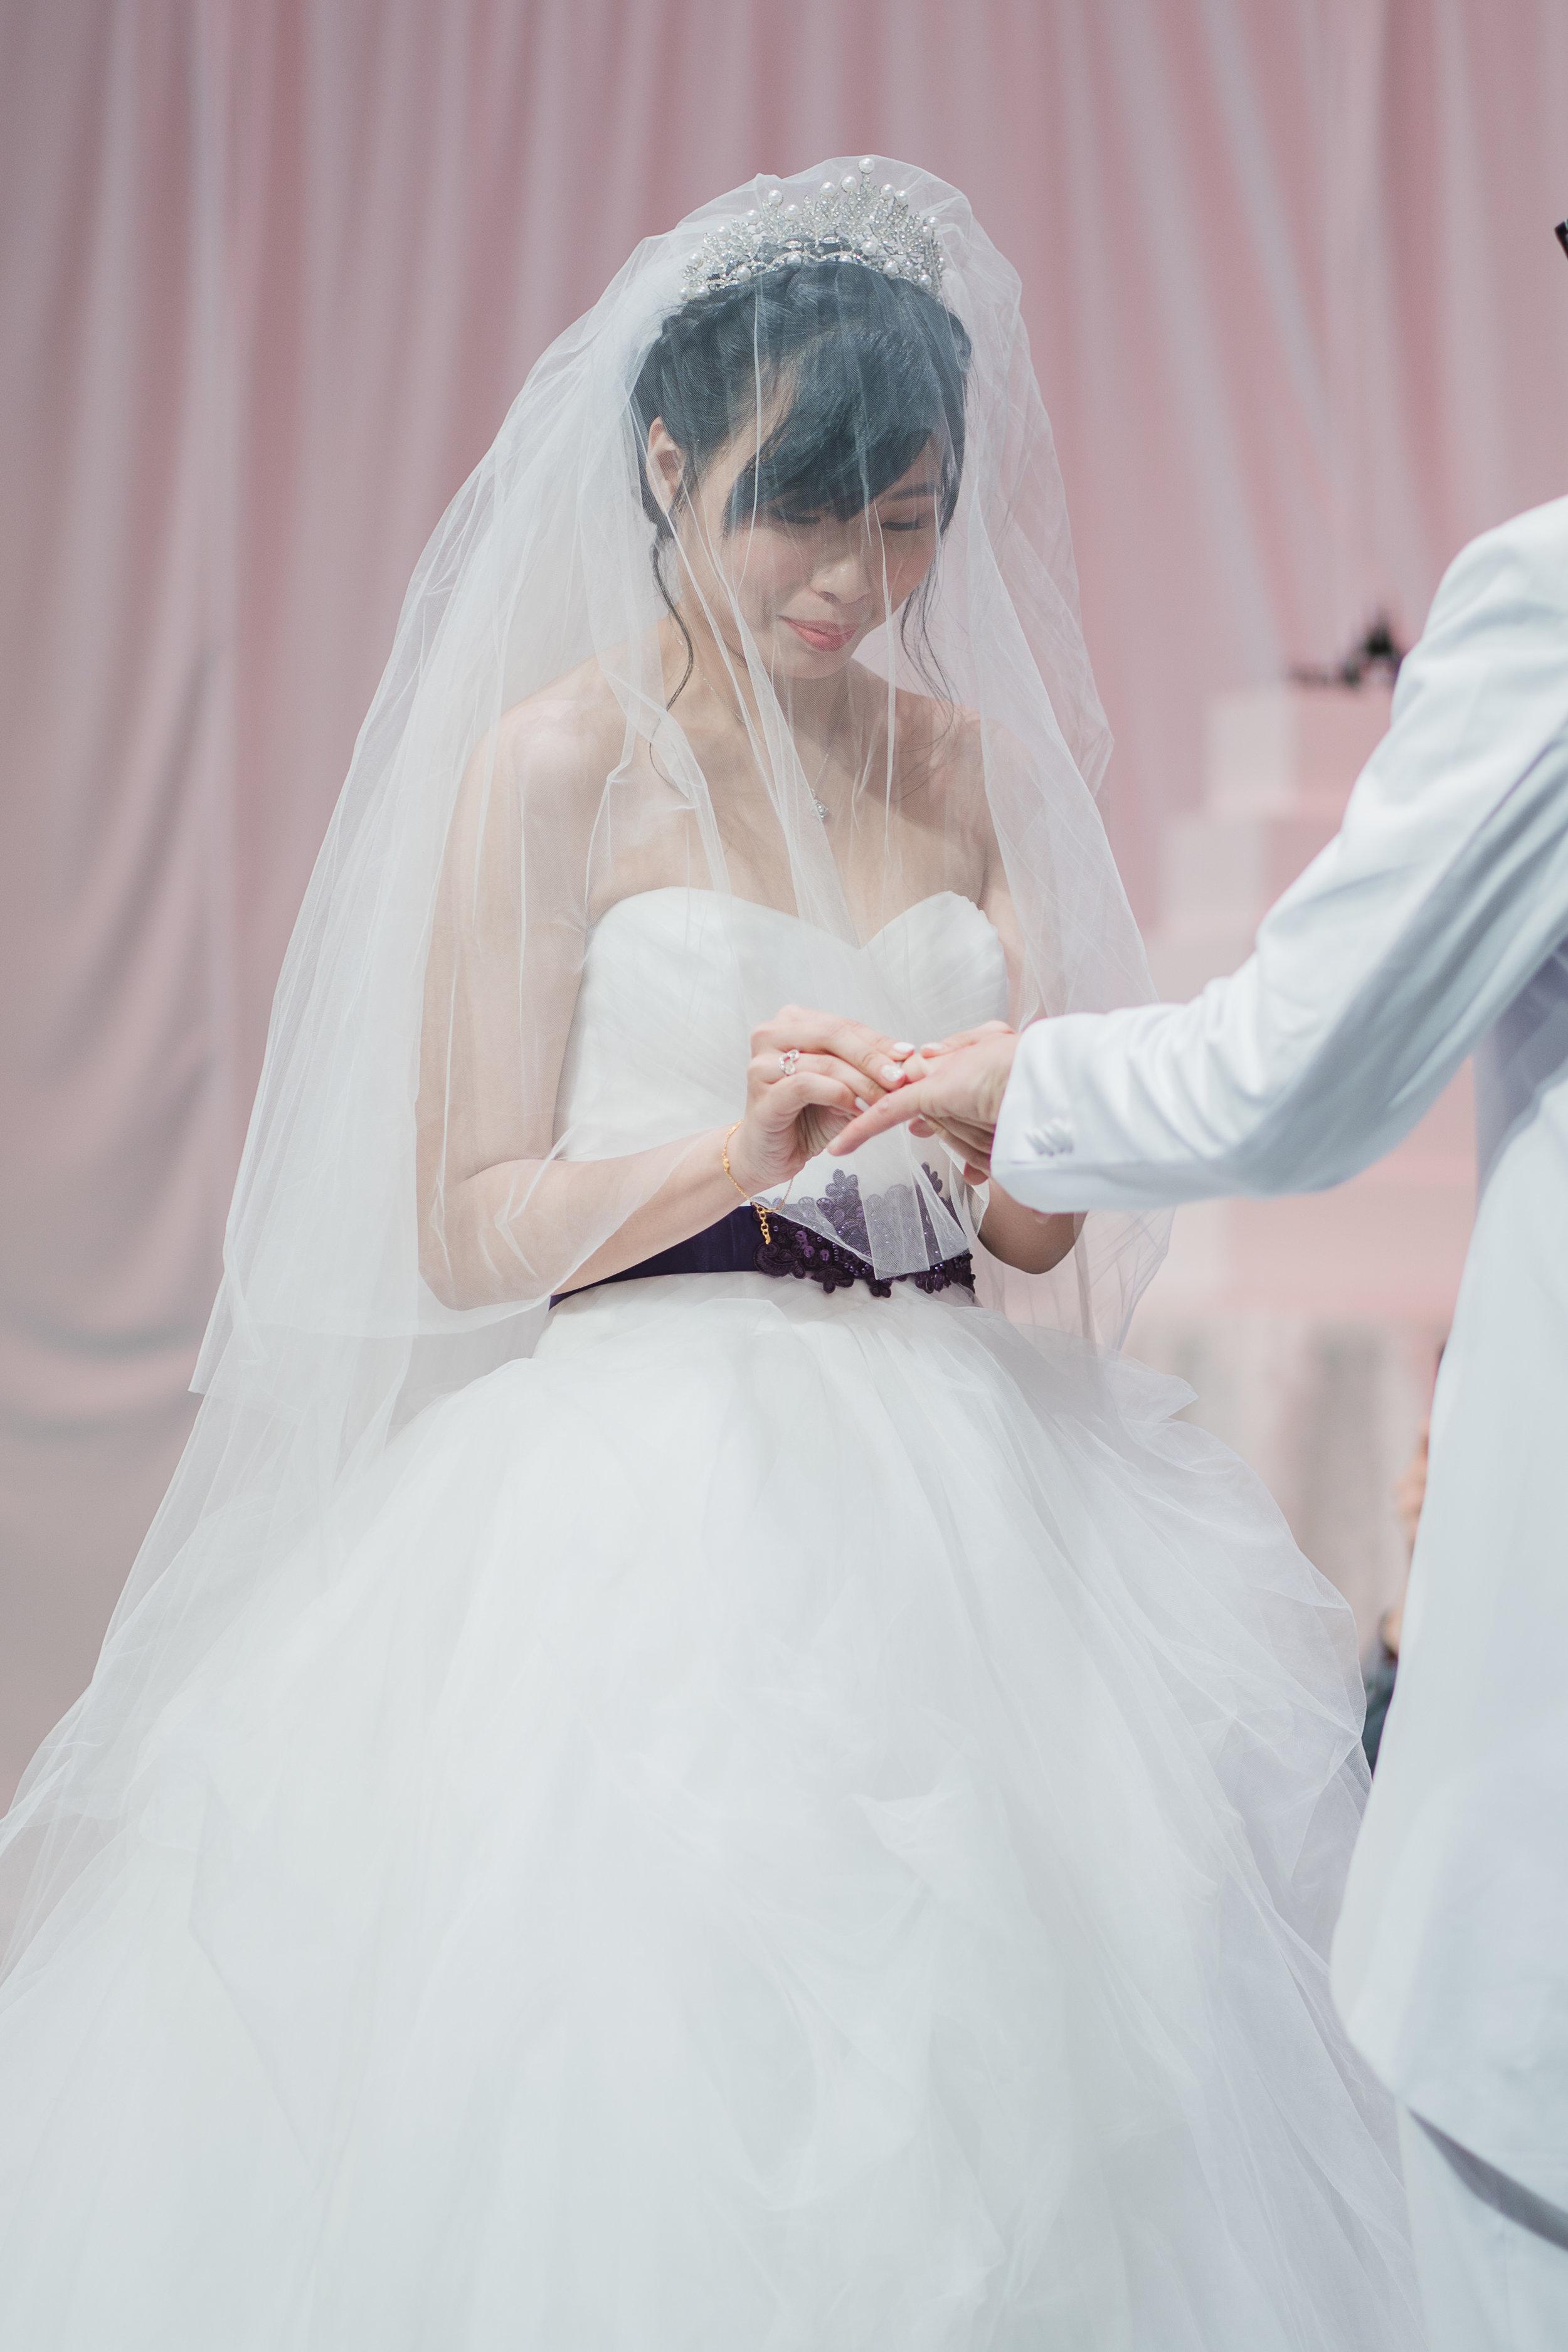 20190520 - Pamela & Matthew Wedding - 0151.jpg